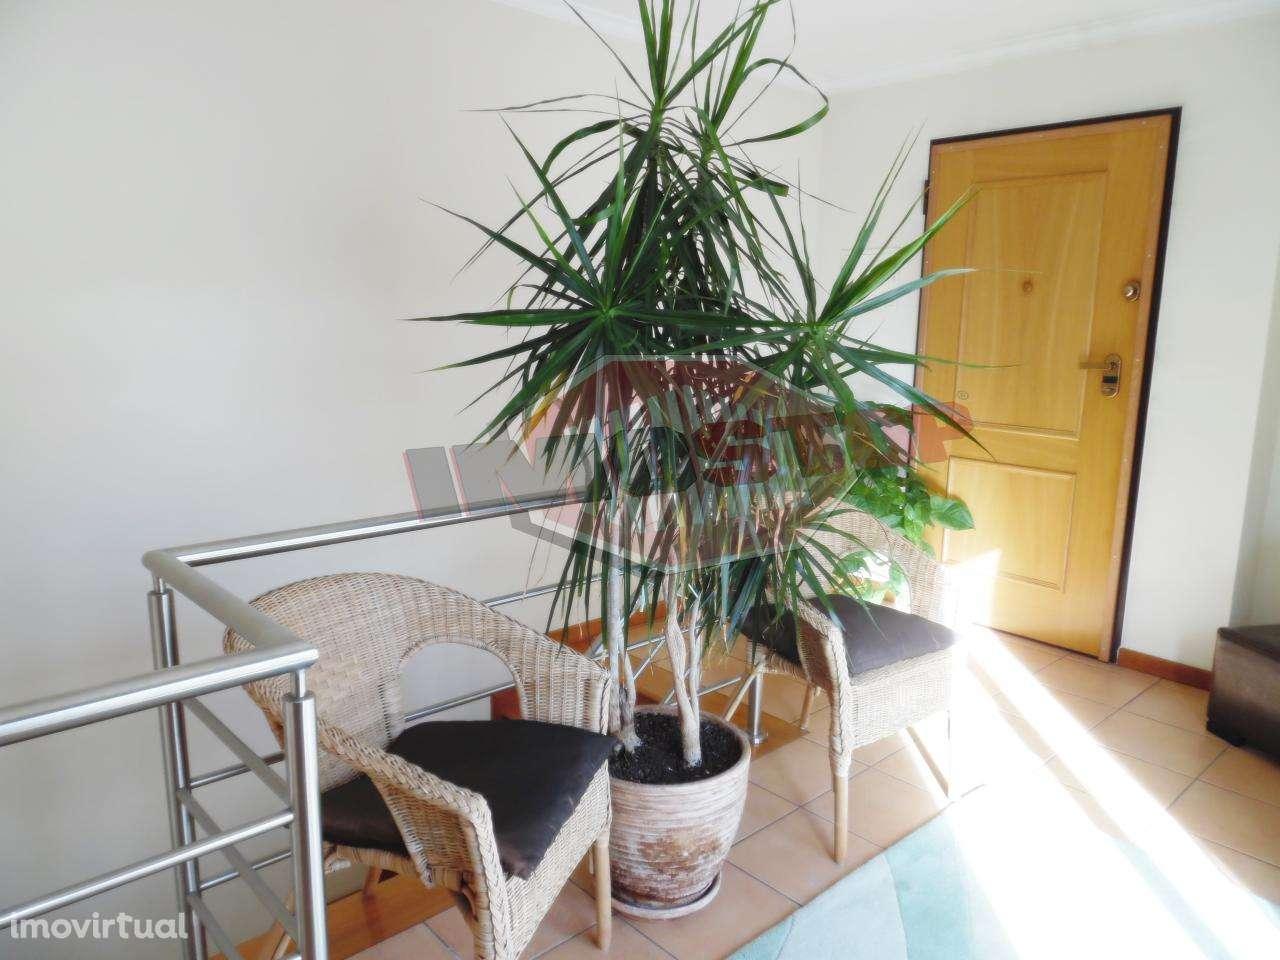 Apartamento para comprar, Oiã, Oliveira do Bairro, Aveiro - Foto 24